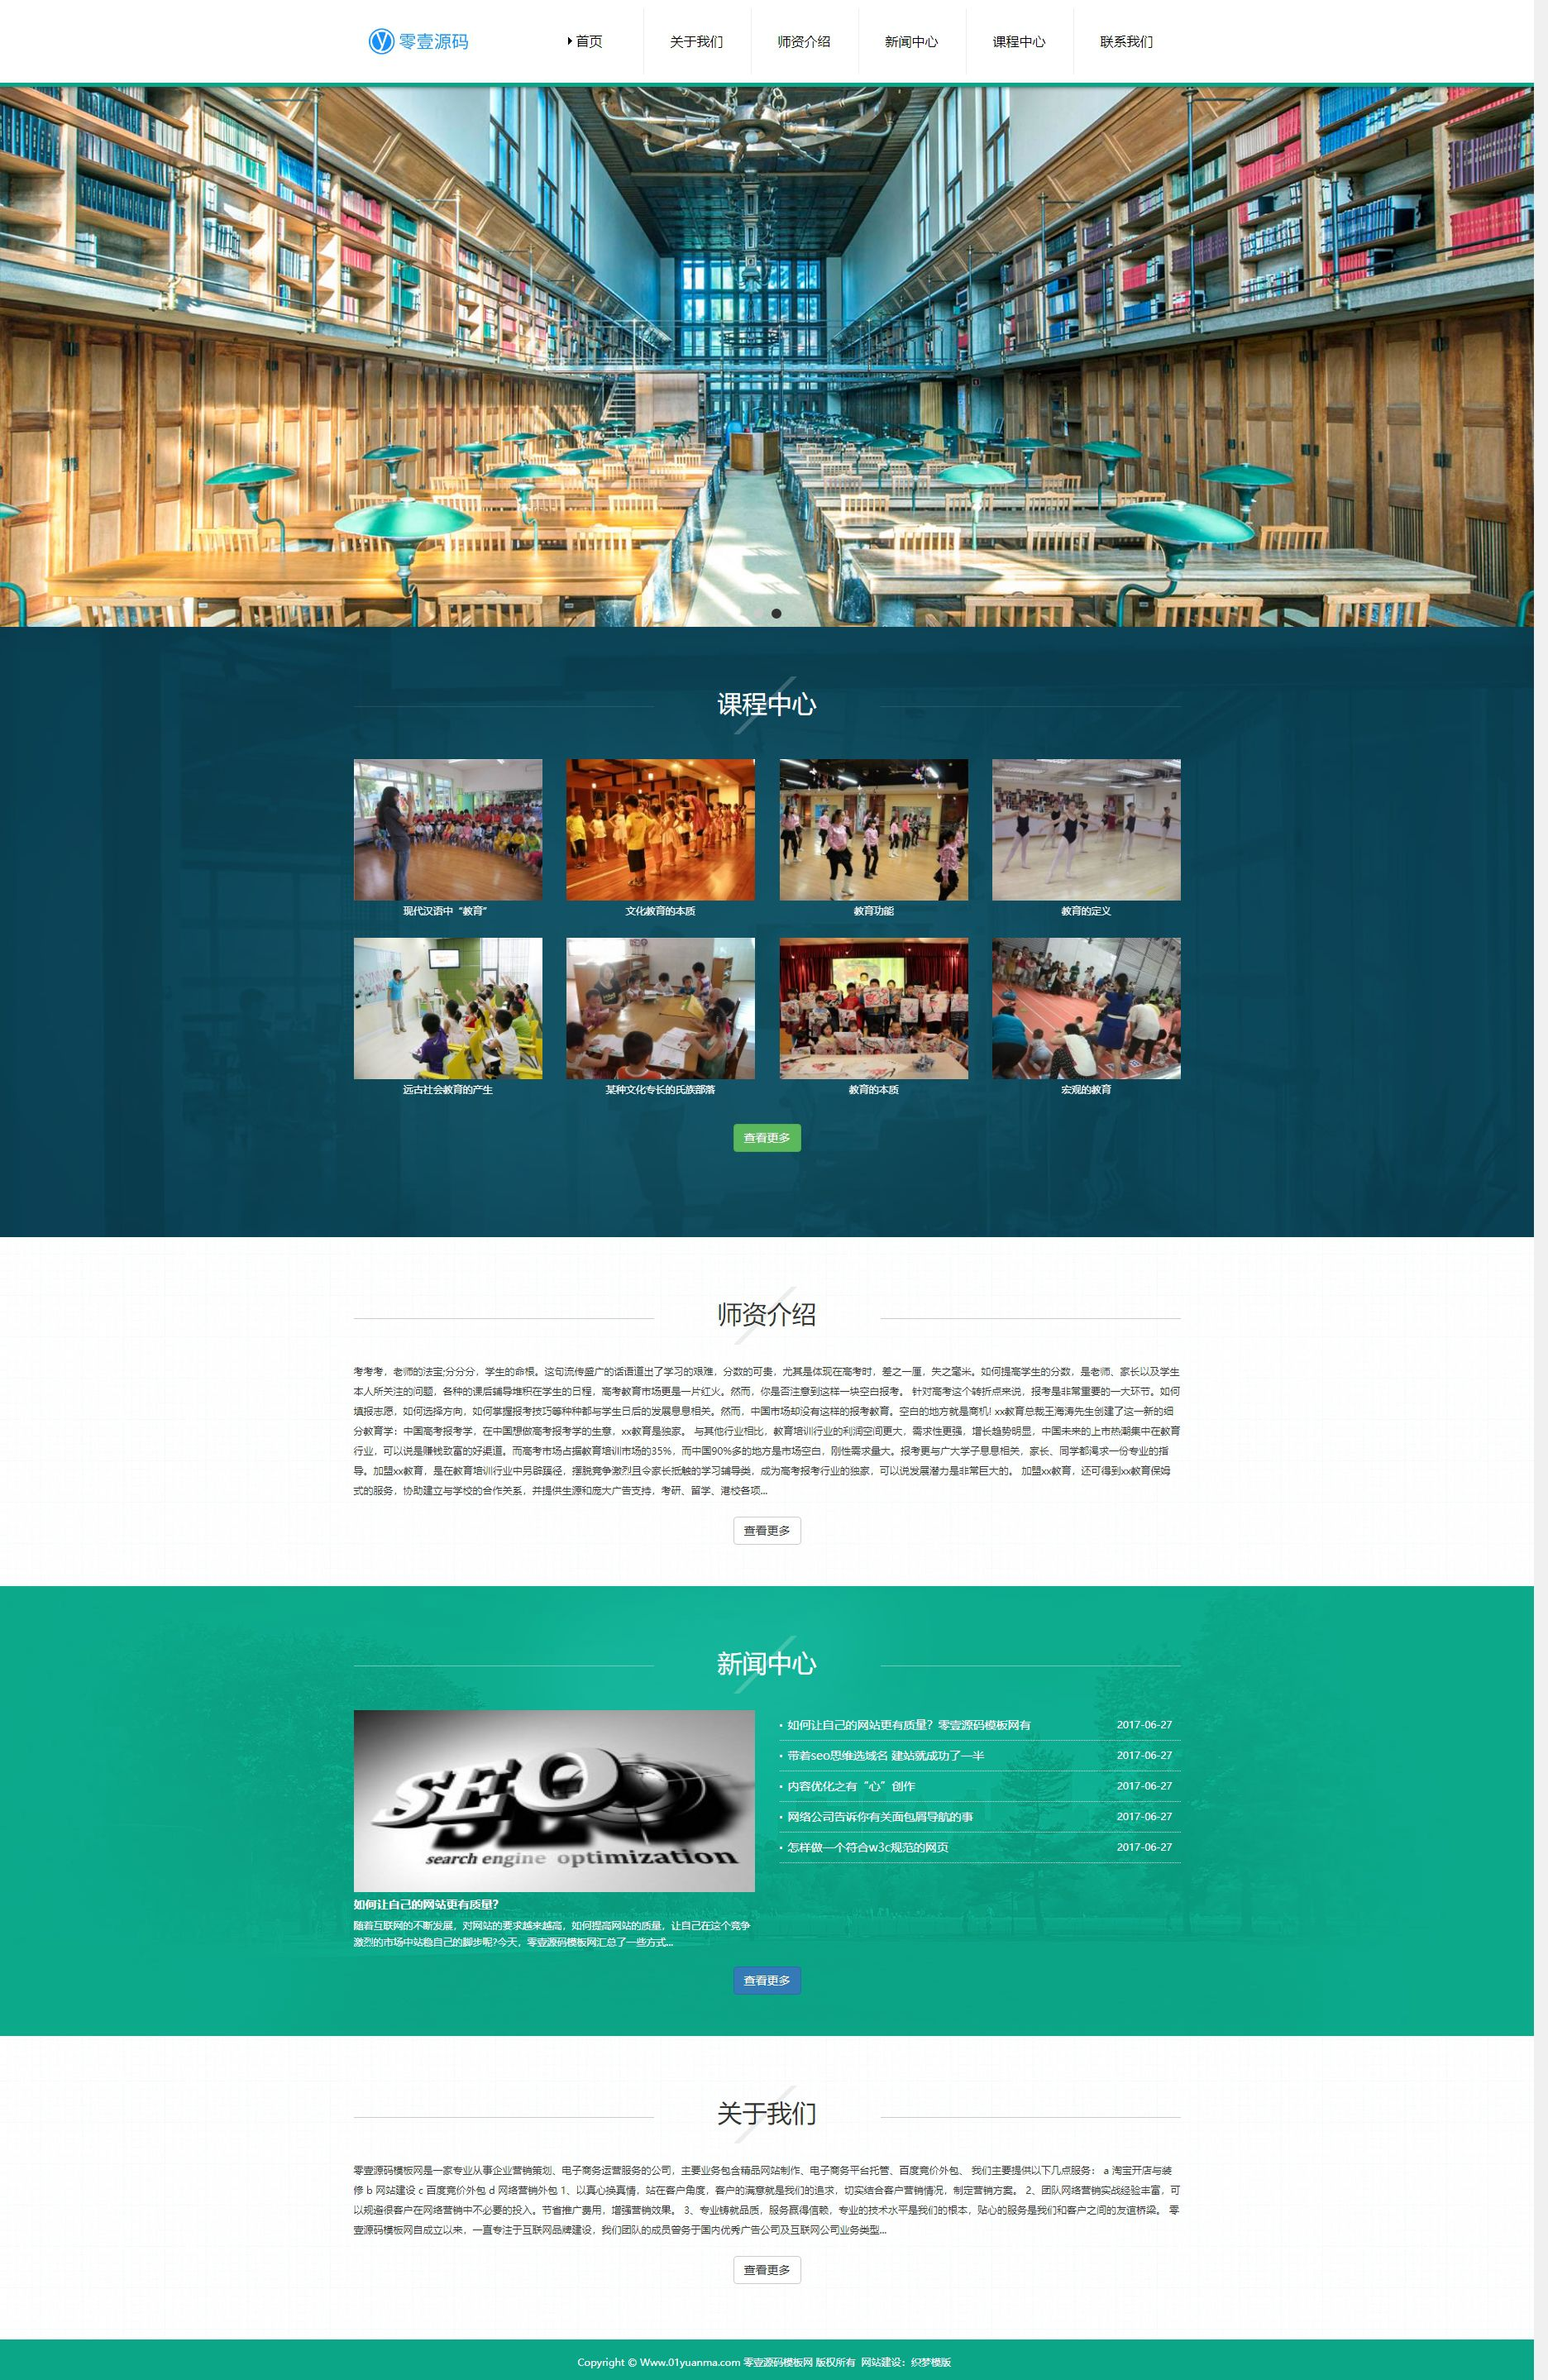 html5教育培训机构网站织梦dedecms模版(自适应手机端)